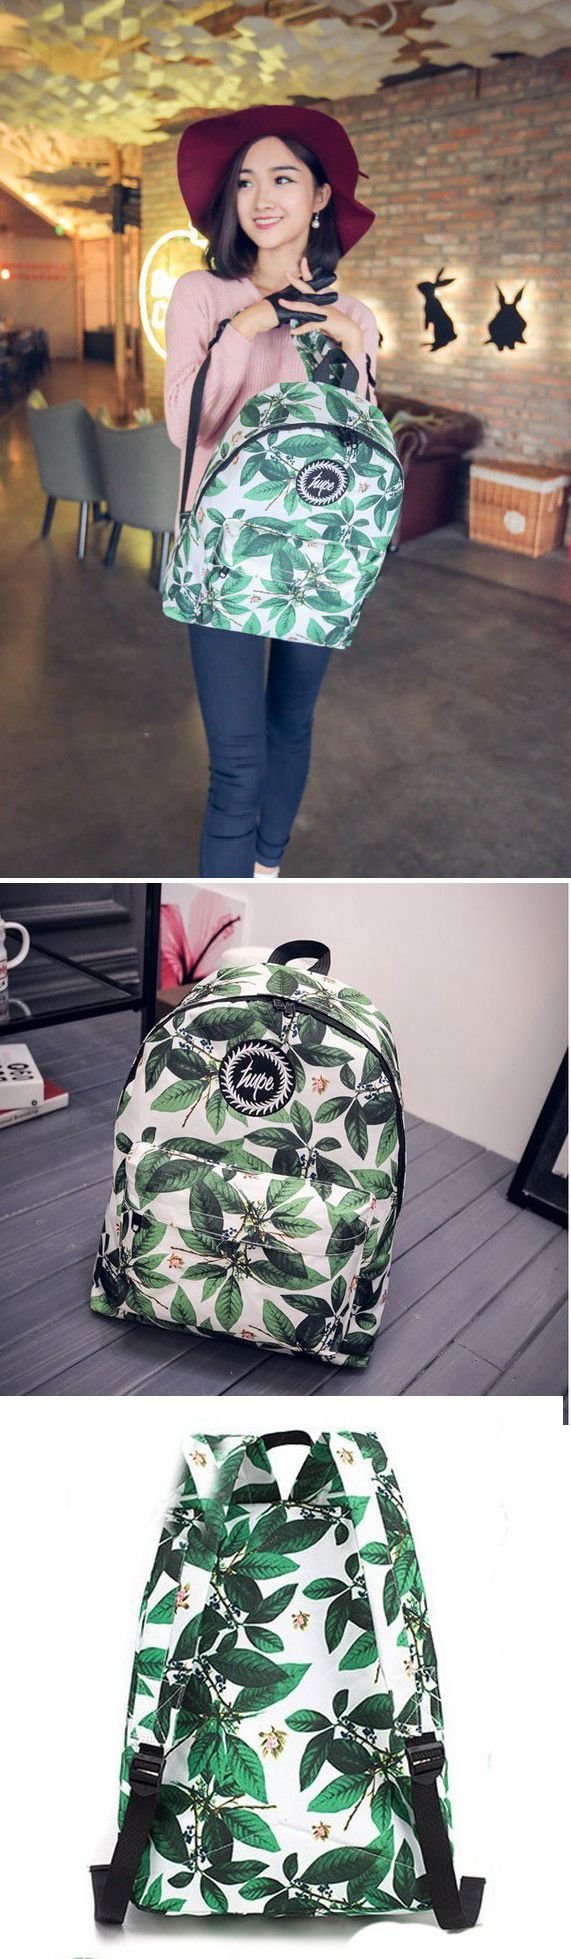 New Arrival Cute Simple Casual Oxford Cloth Backpack& Leaves Pattern Printed Schoolbag, backpacks for girls, pink backpack, mini backpack, cool backpacks, backpacks for women, leather backpack, travel backpack, laptop backpack, school backpacks, cute backpacks, hiking backpack, bookbags, waterproof backpack,